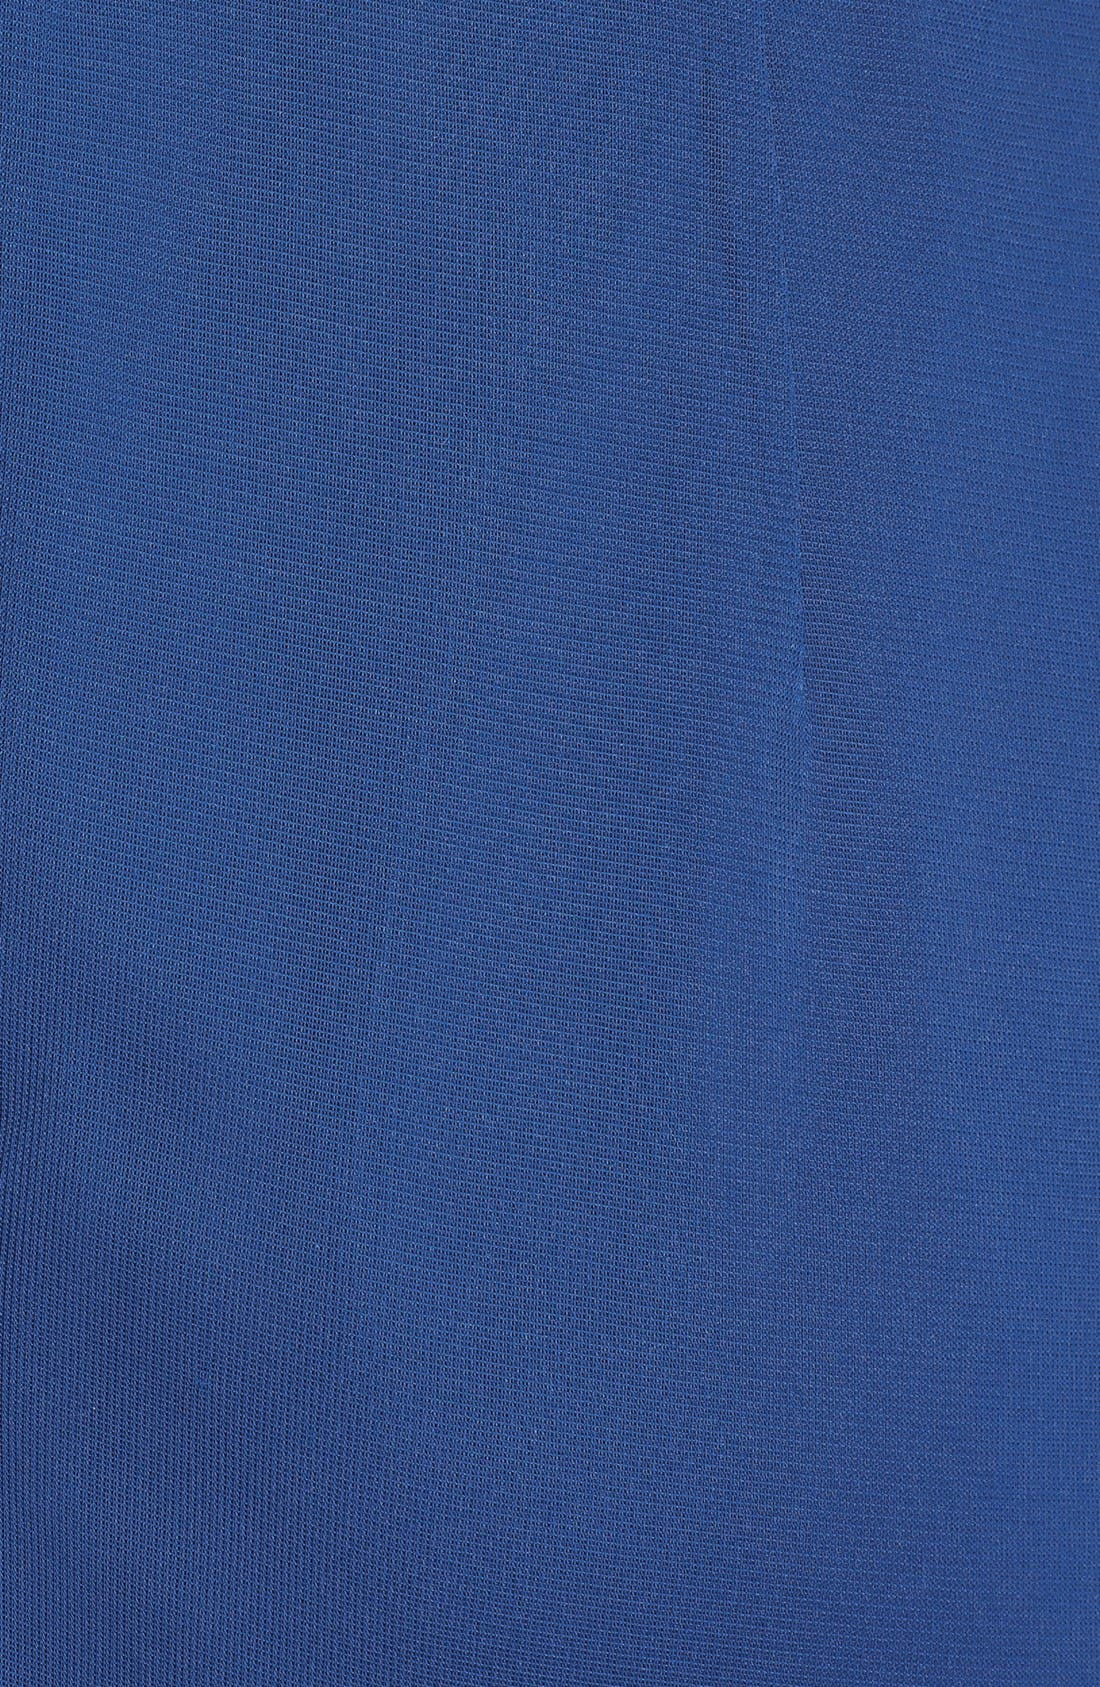 Alternate Image 3  - Alex Evenings Embellished Cap Sleeve Gown